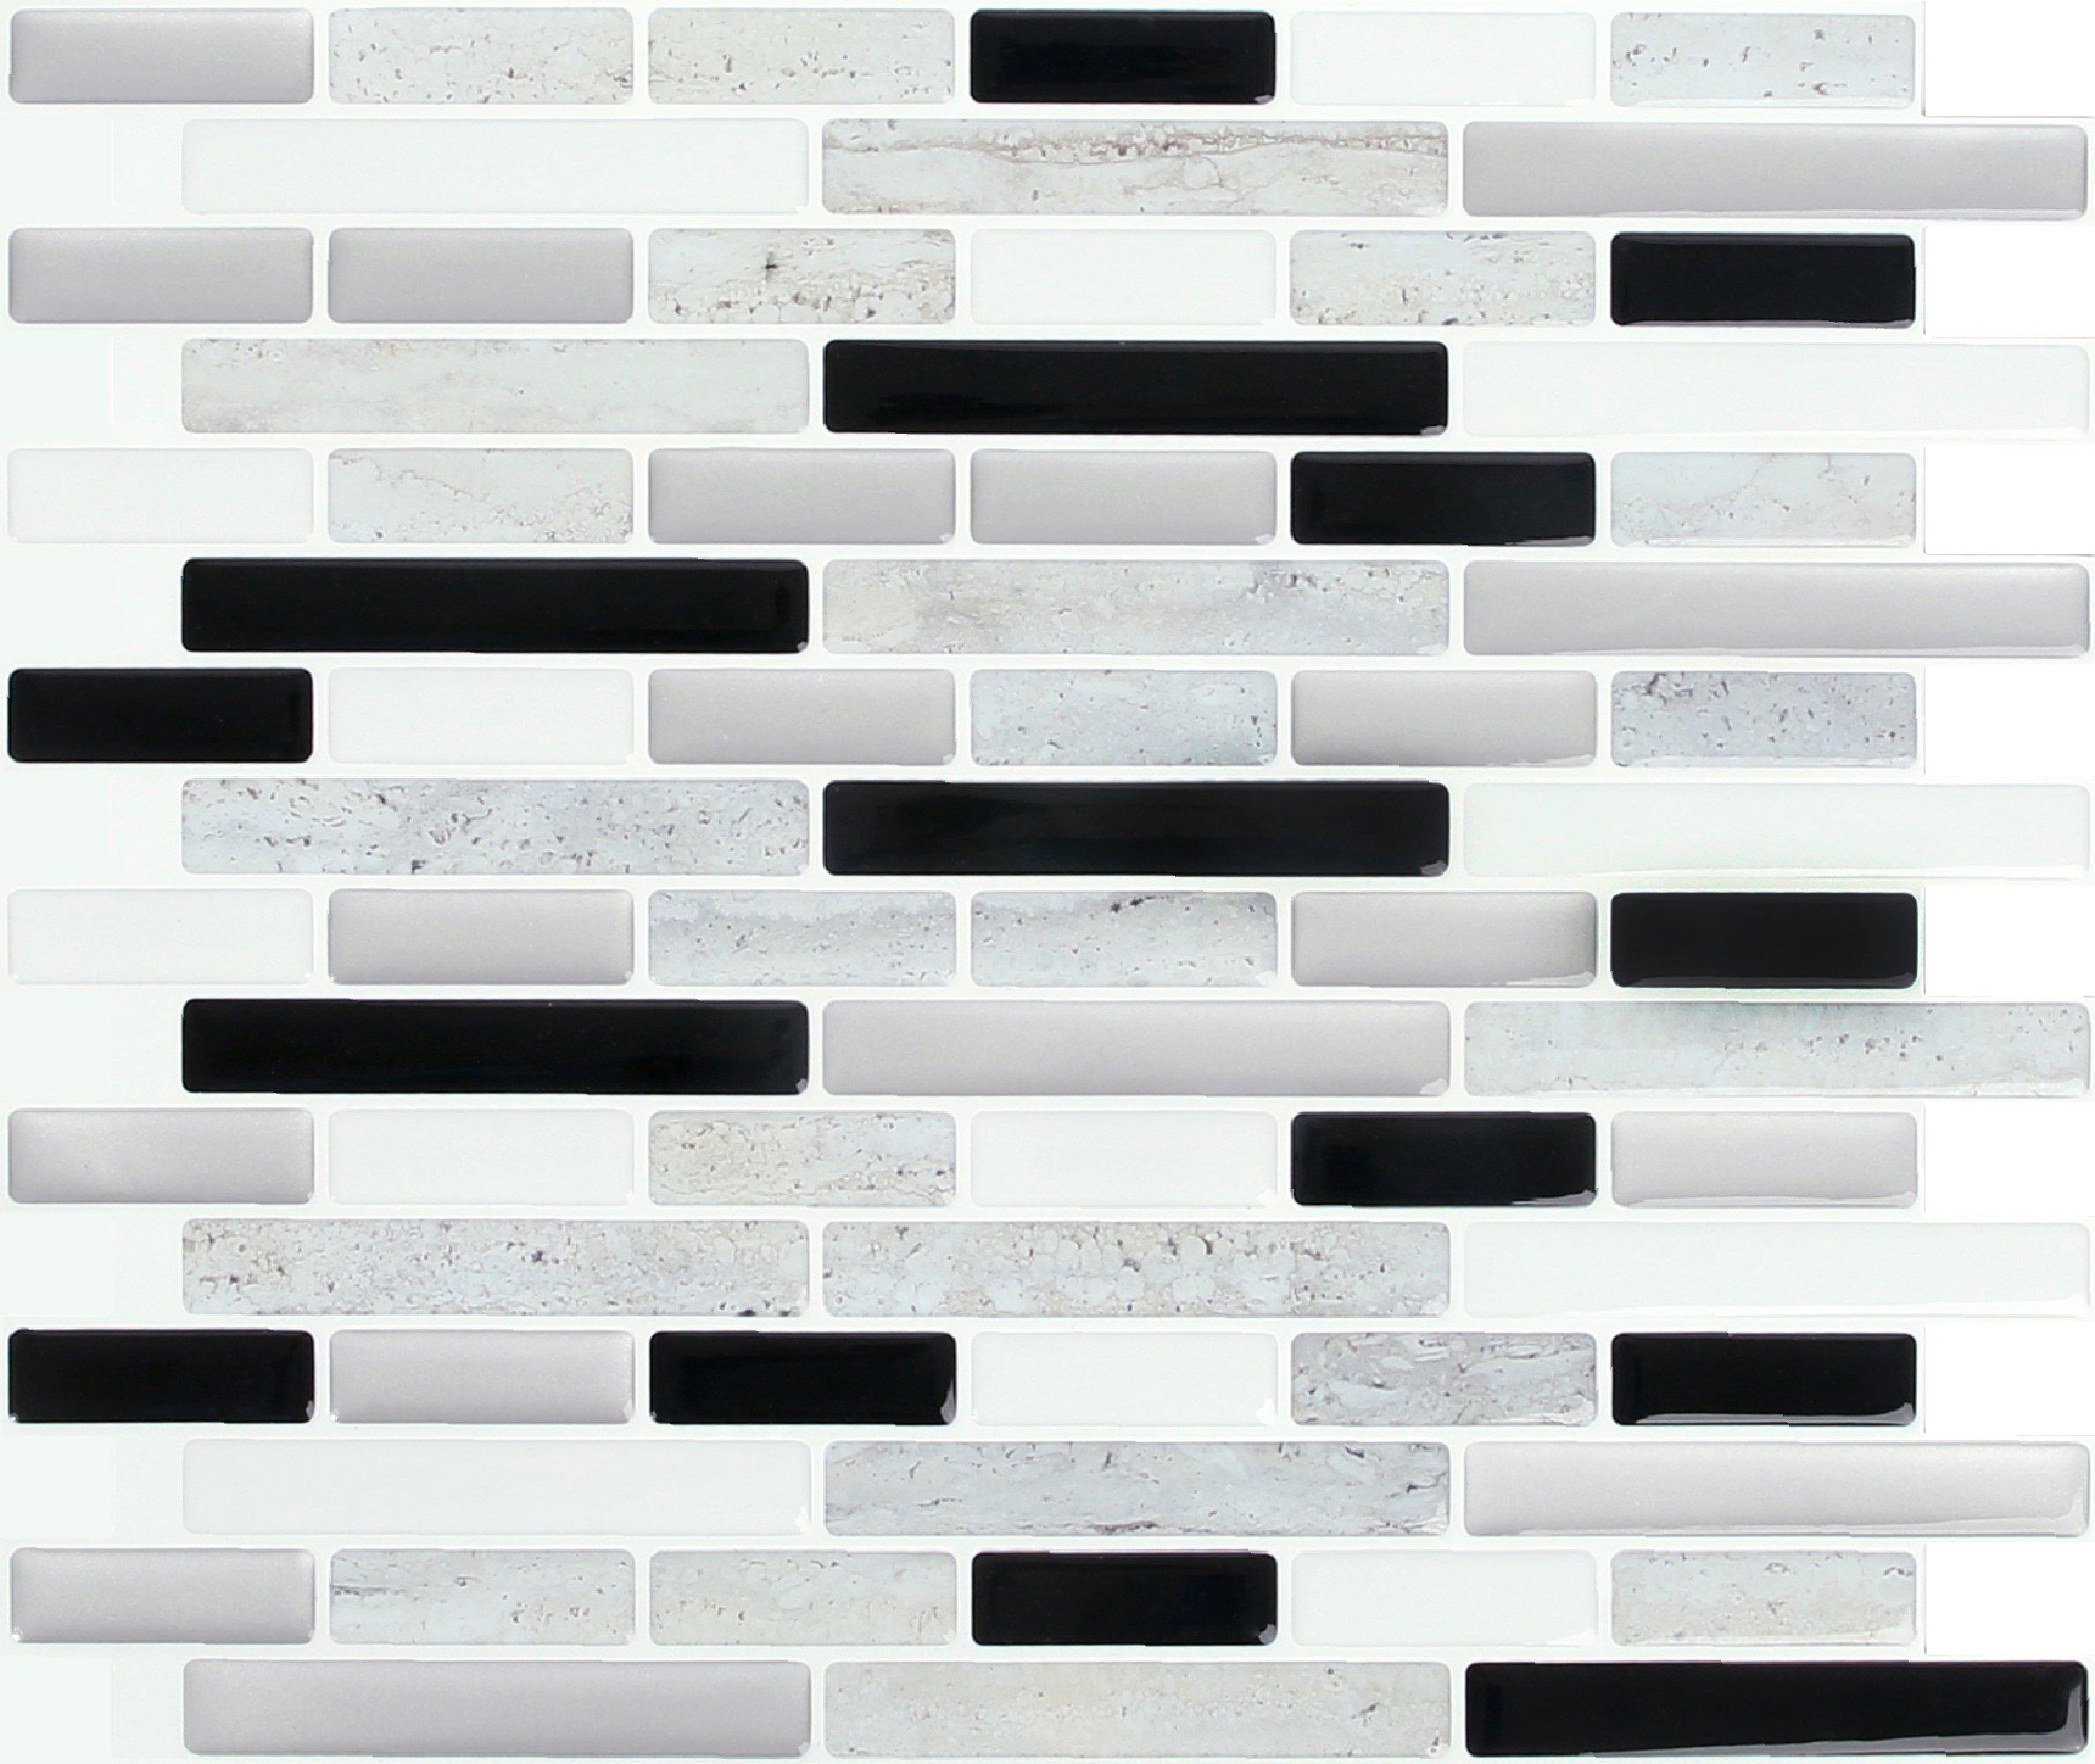 Peel and Impress - Easy DIY Peel and Stick Adhesive Backsplash Tiles, 24048B Space Grey Marble, Oblong, 11'' x 9.25'' (40 Tiles)